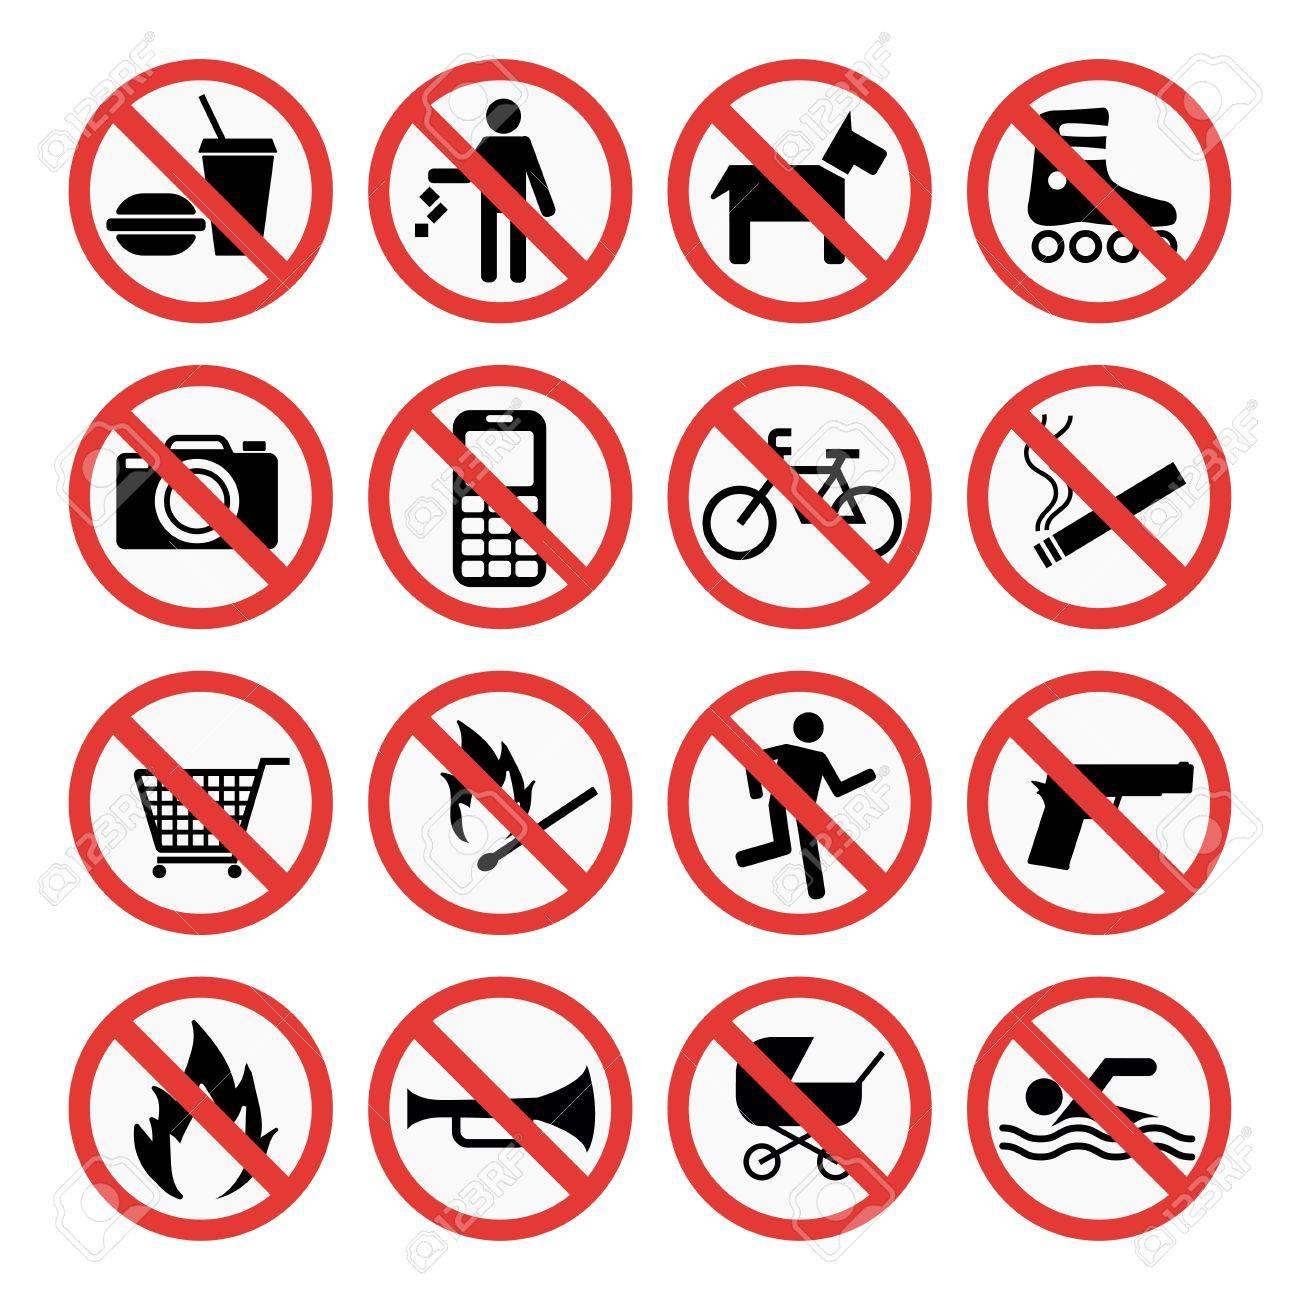 Prohibition signs set safety information vector illustration. - 74099034